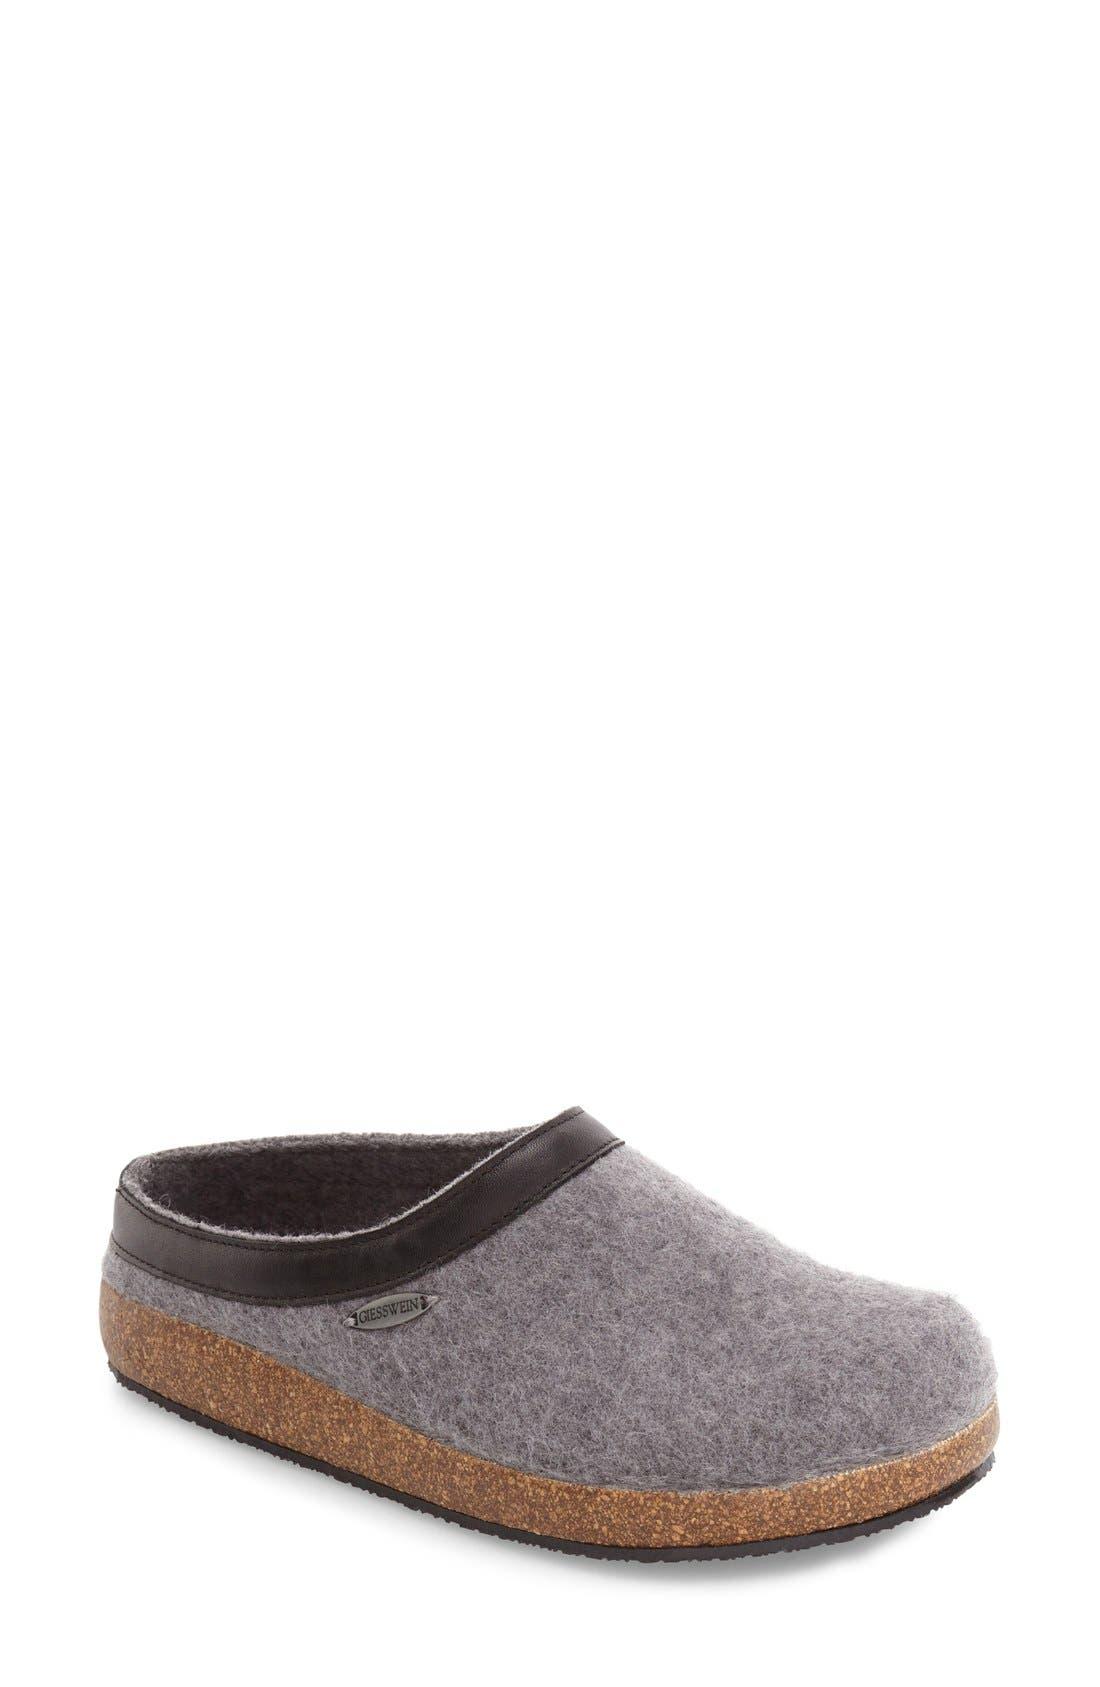 Acadia Water Repellent Slipper,                         Main,                         color, Slate Wool